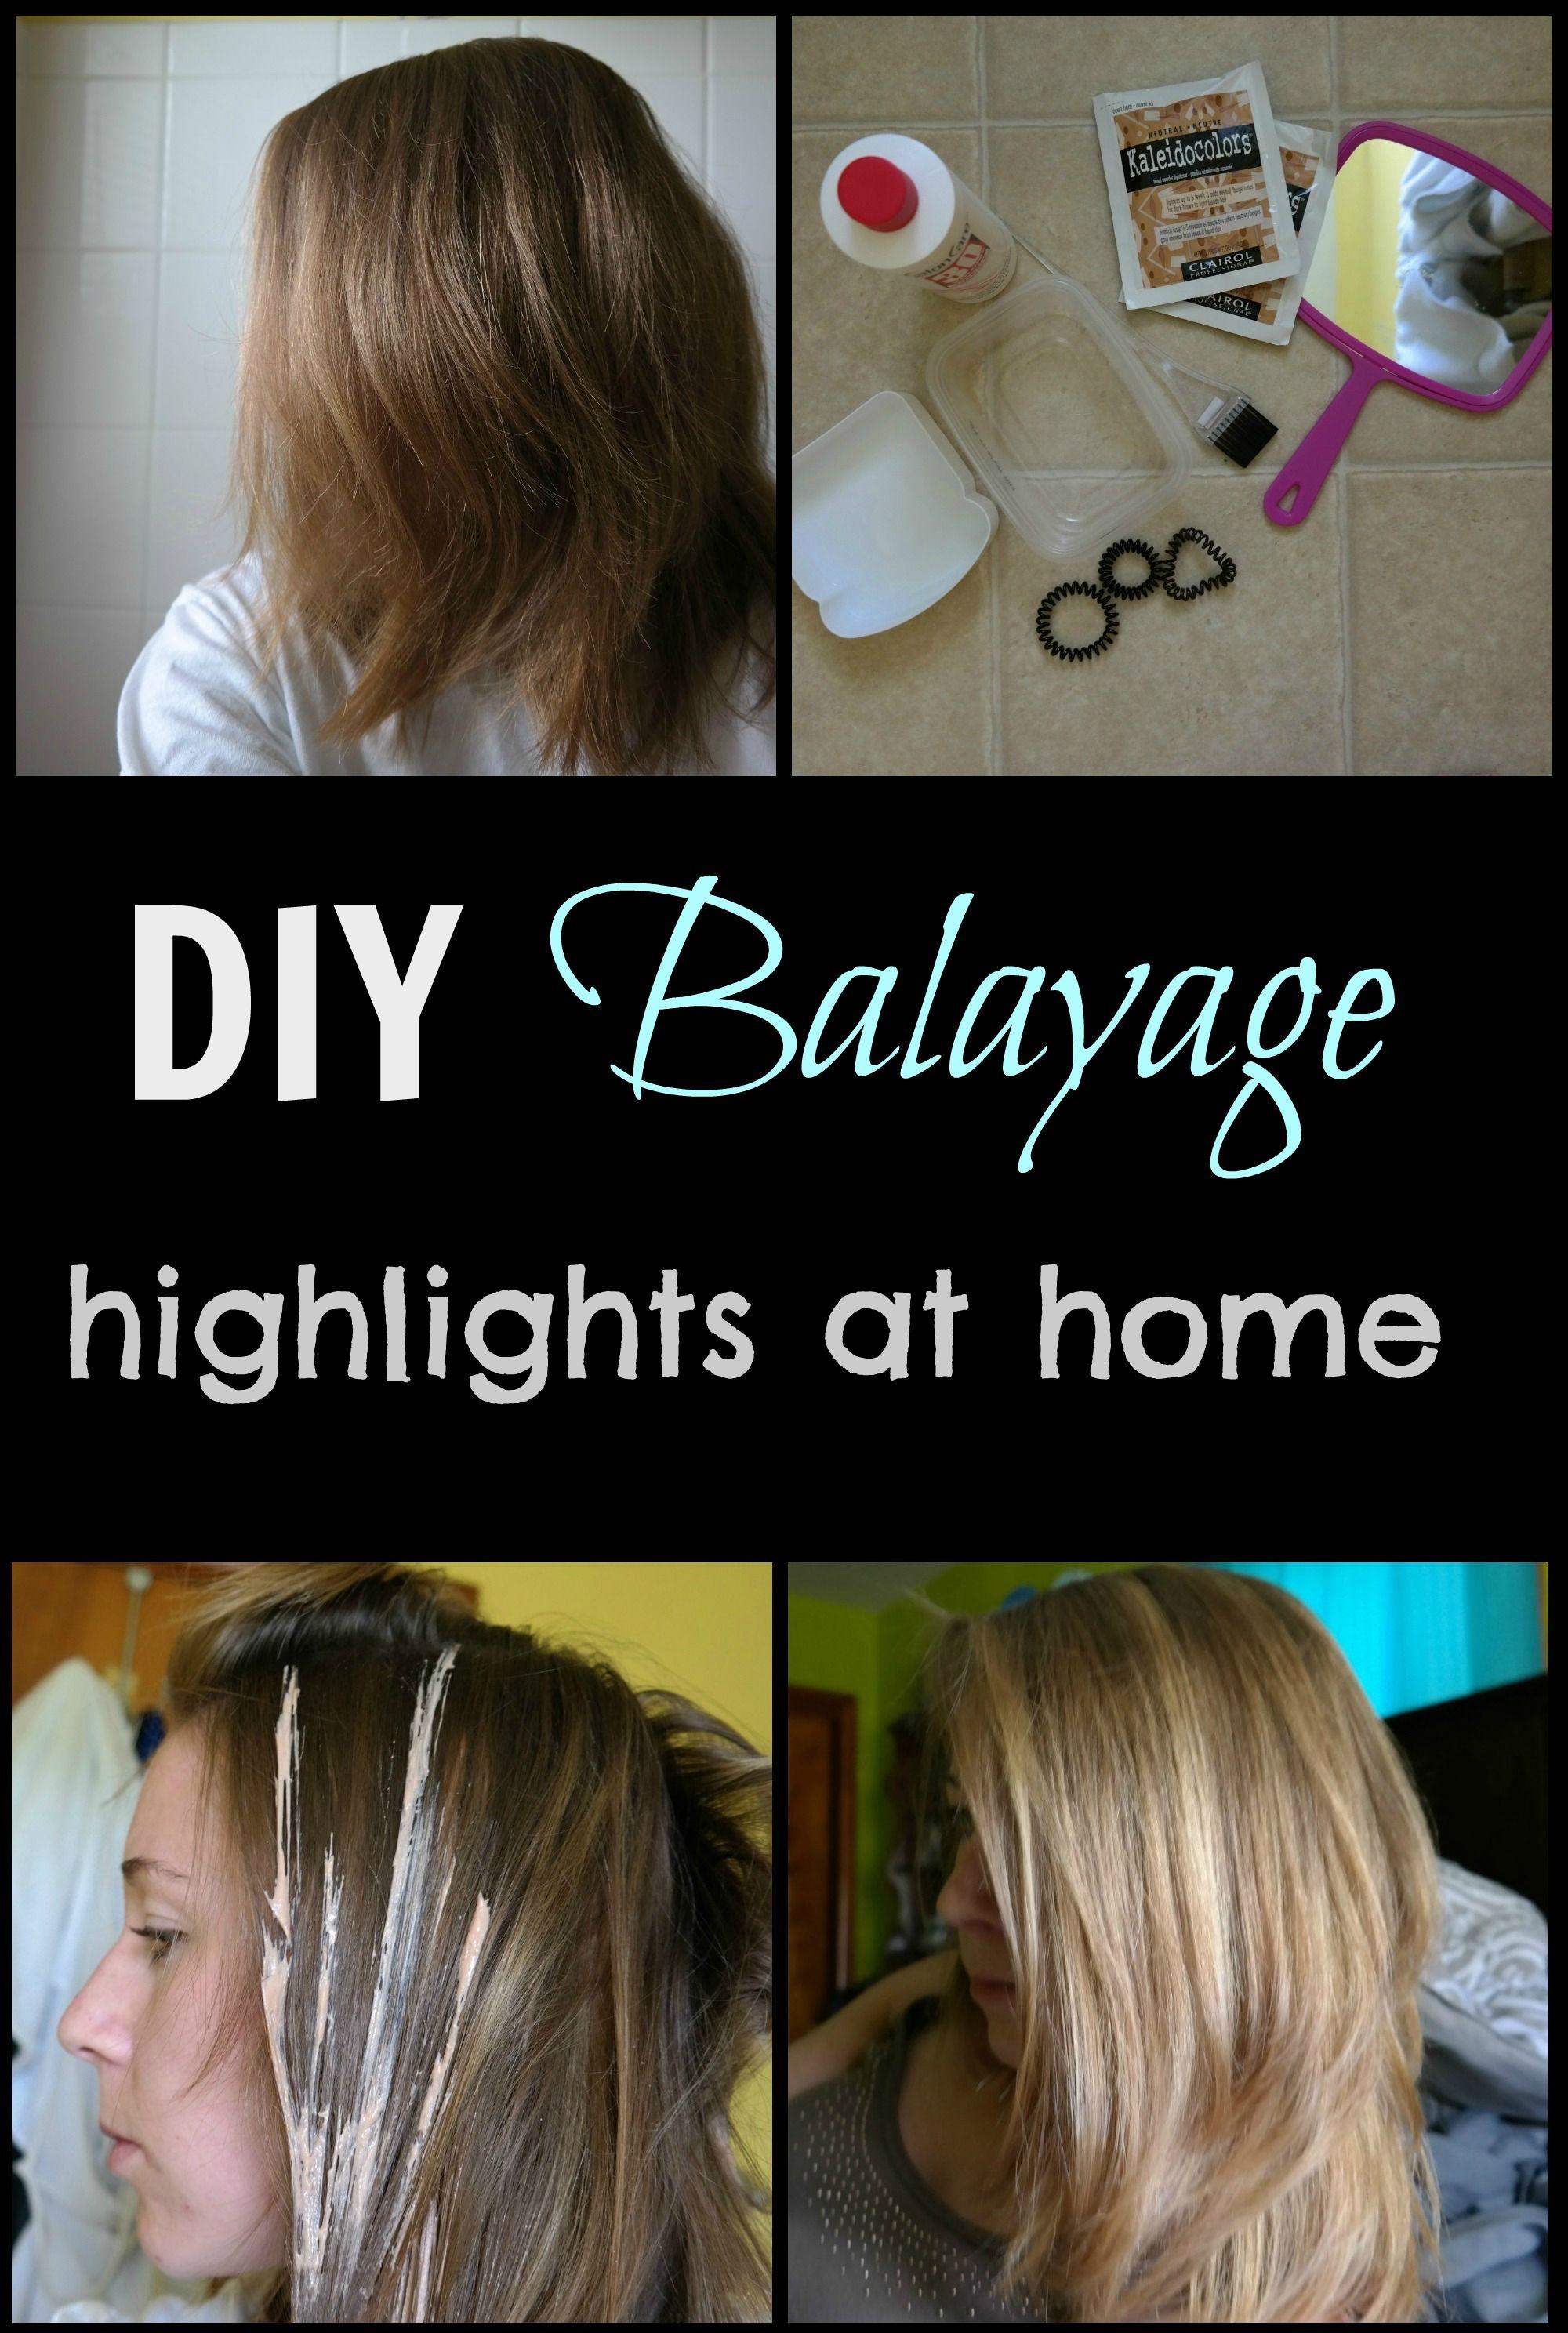 Diy balayage highlights at home tutorial cheap and easy